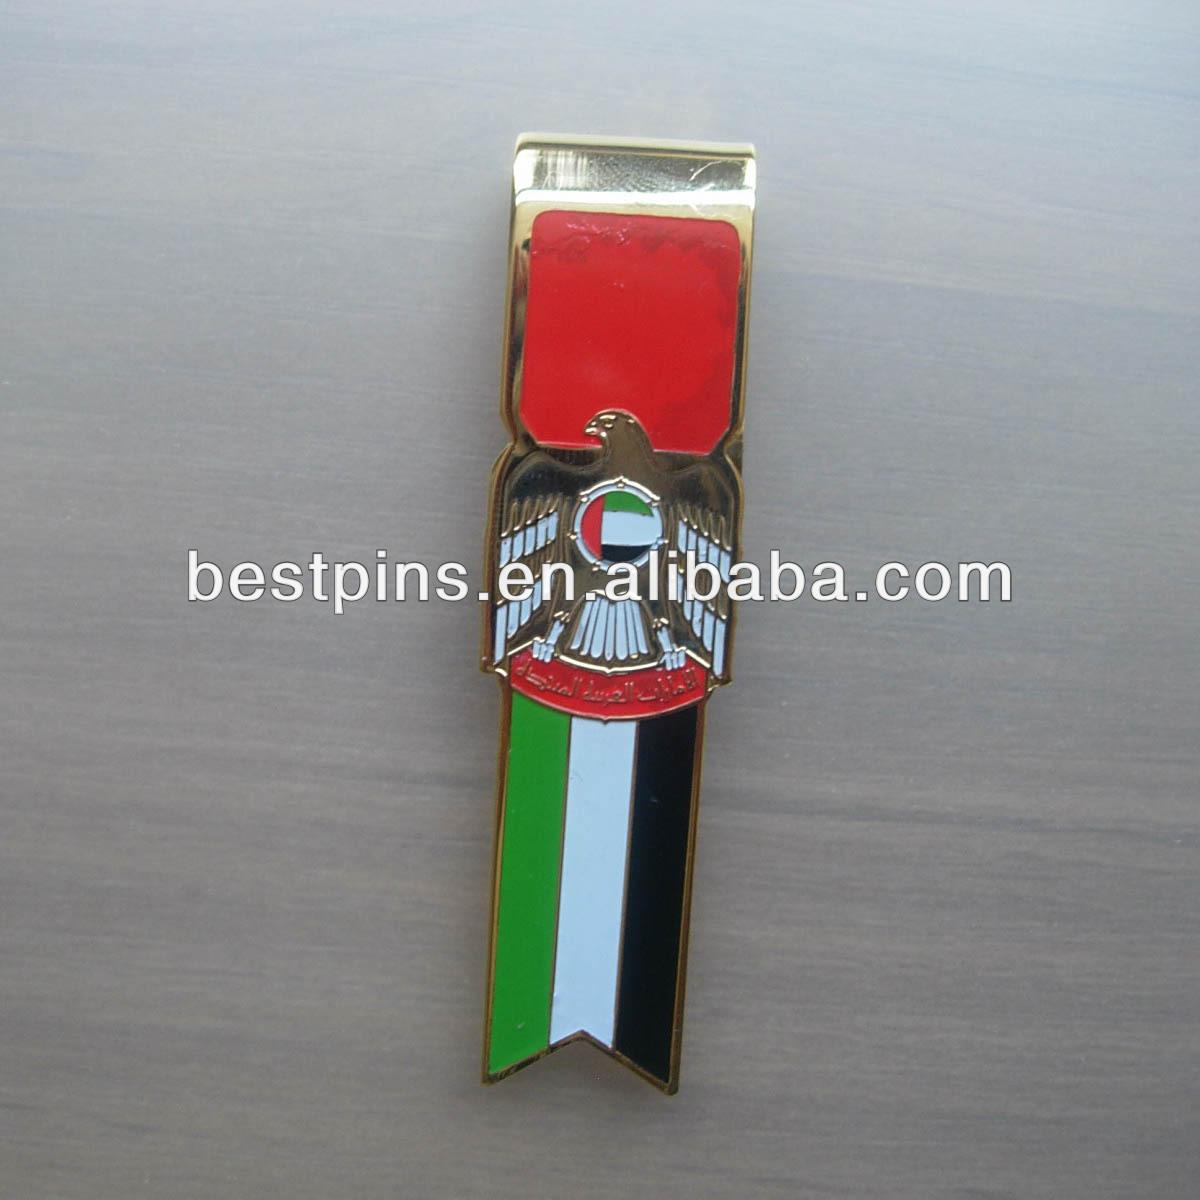 Uae National Emblem Custom Metal Uae National